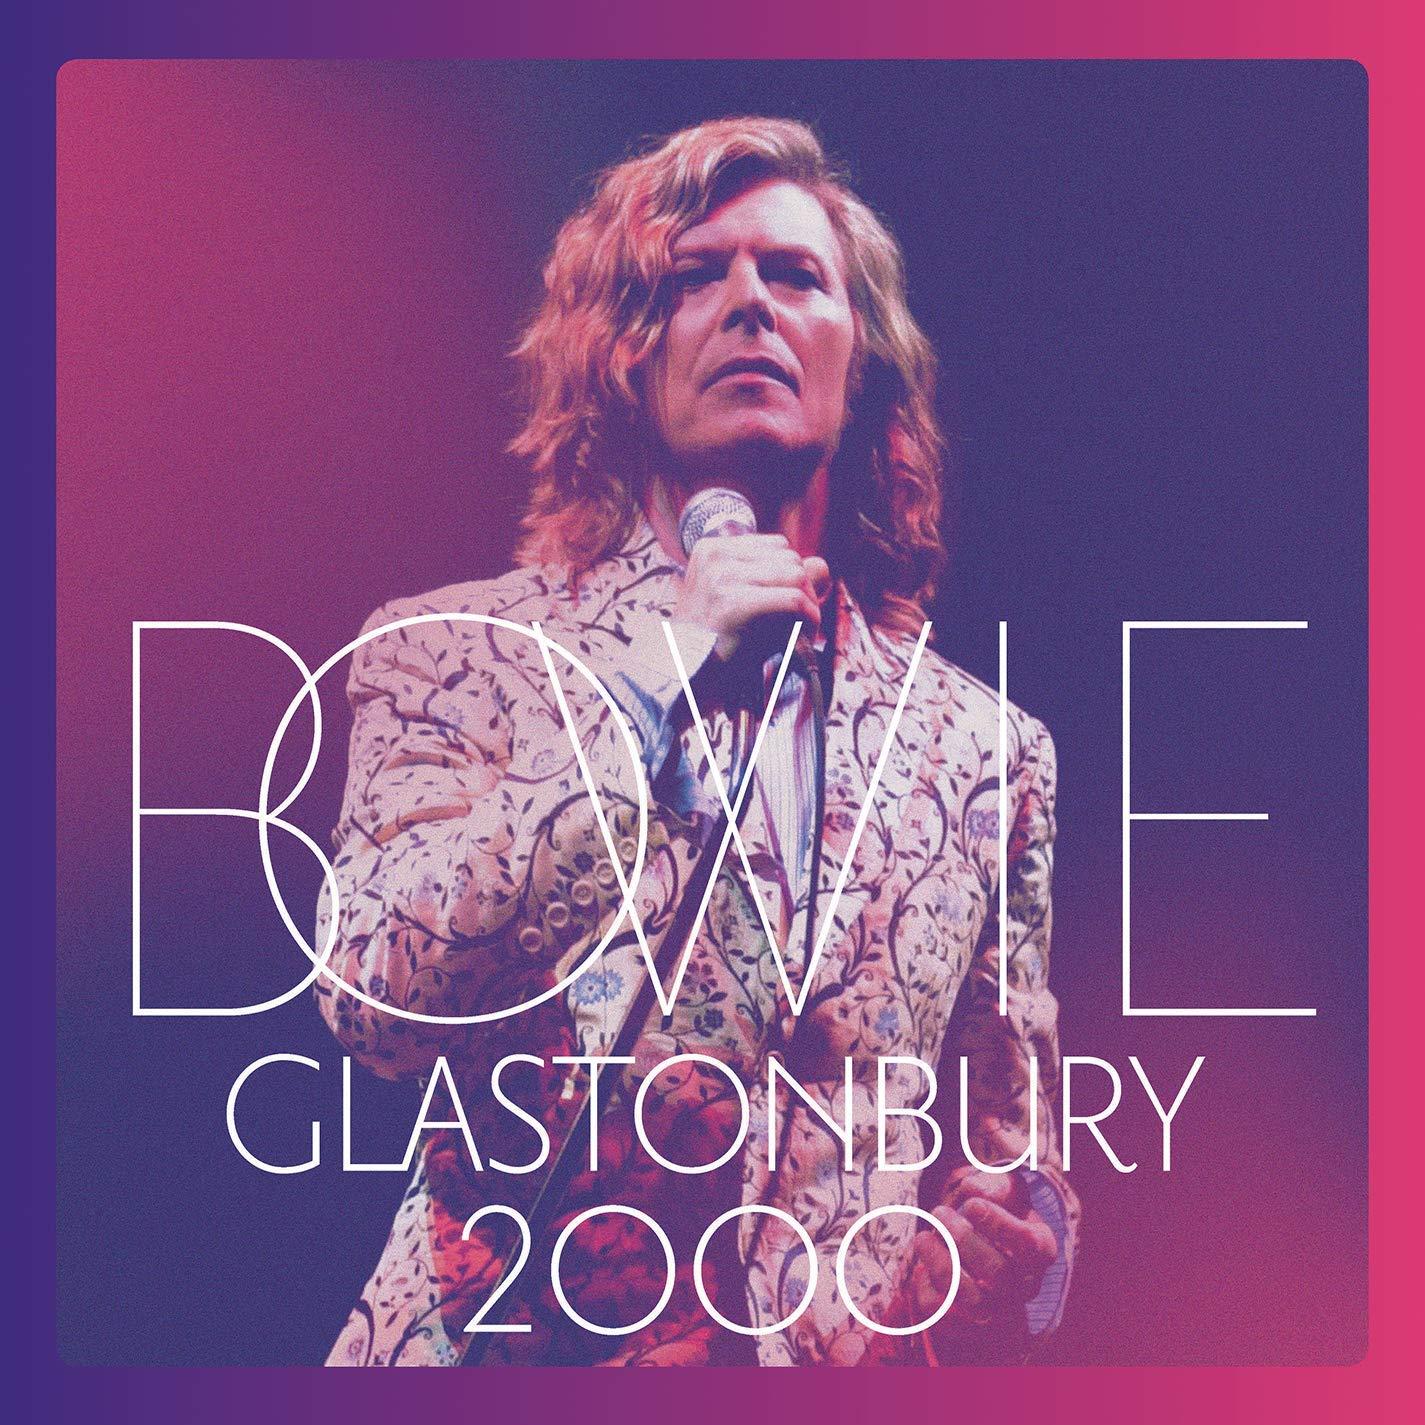 2511458-426277-Audio-Cd-David-Bowie-Glastonbury-2000-2-Cd-Dvd